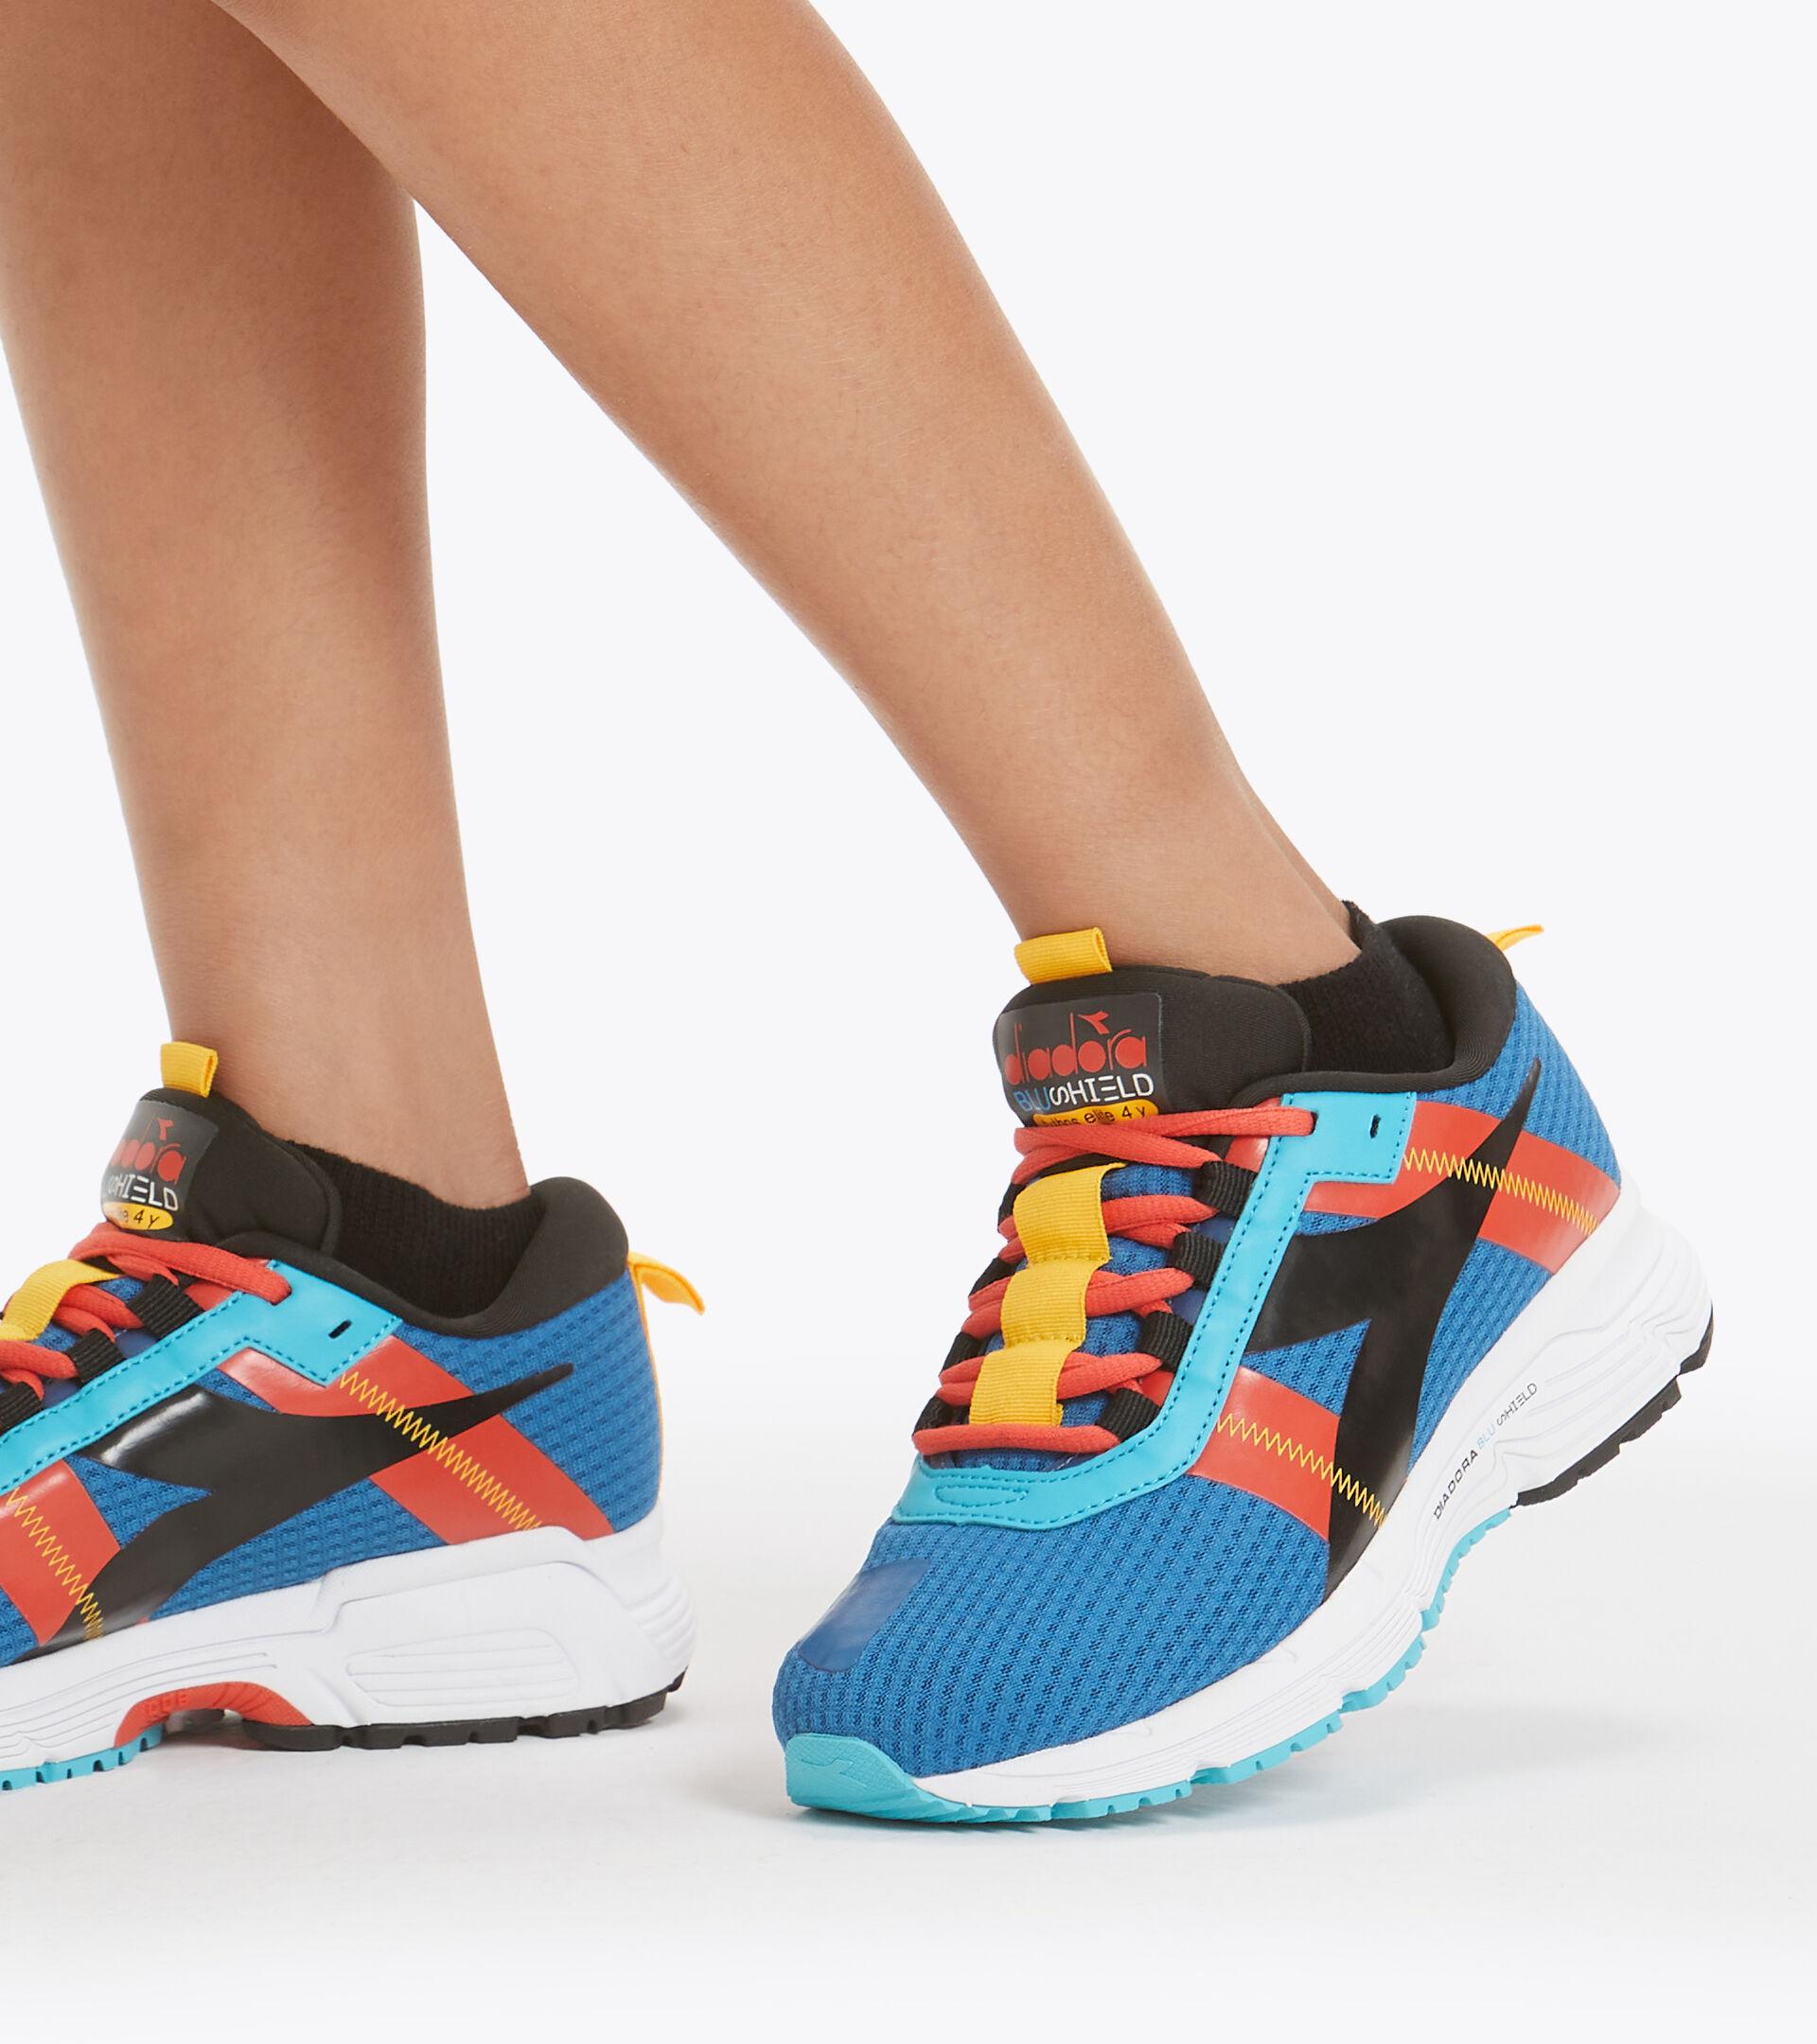 Chaussures de running - Unisexe enfant MYTHOS BLUSHIELD ELITE 4 Y BLEU MYKONOS/NOIR/RG FIESTA - Diadora